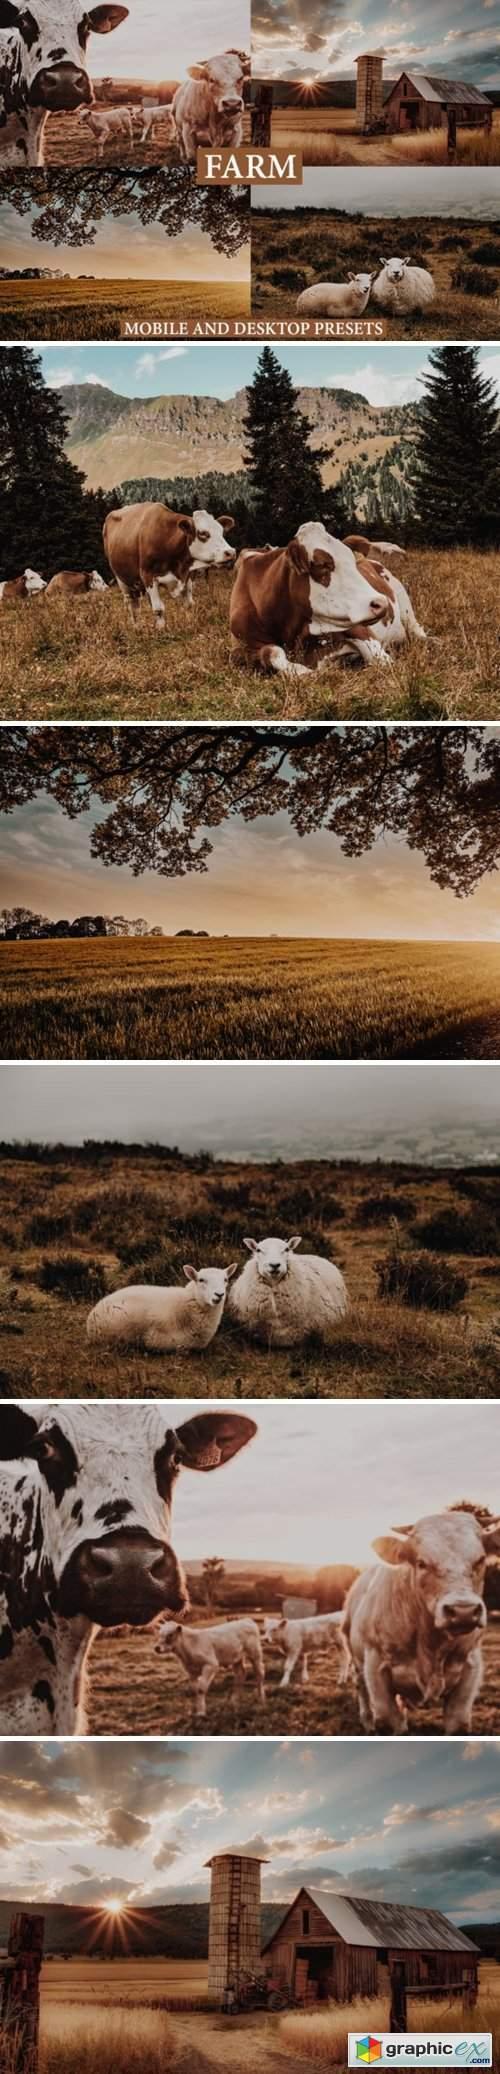 Cinematic Farm Mobile & Desktop Presets